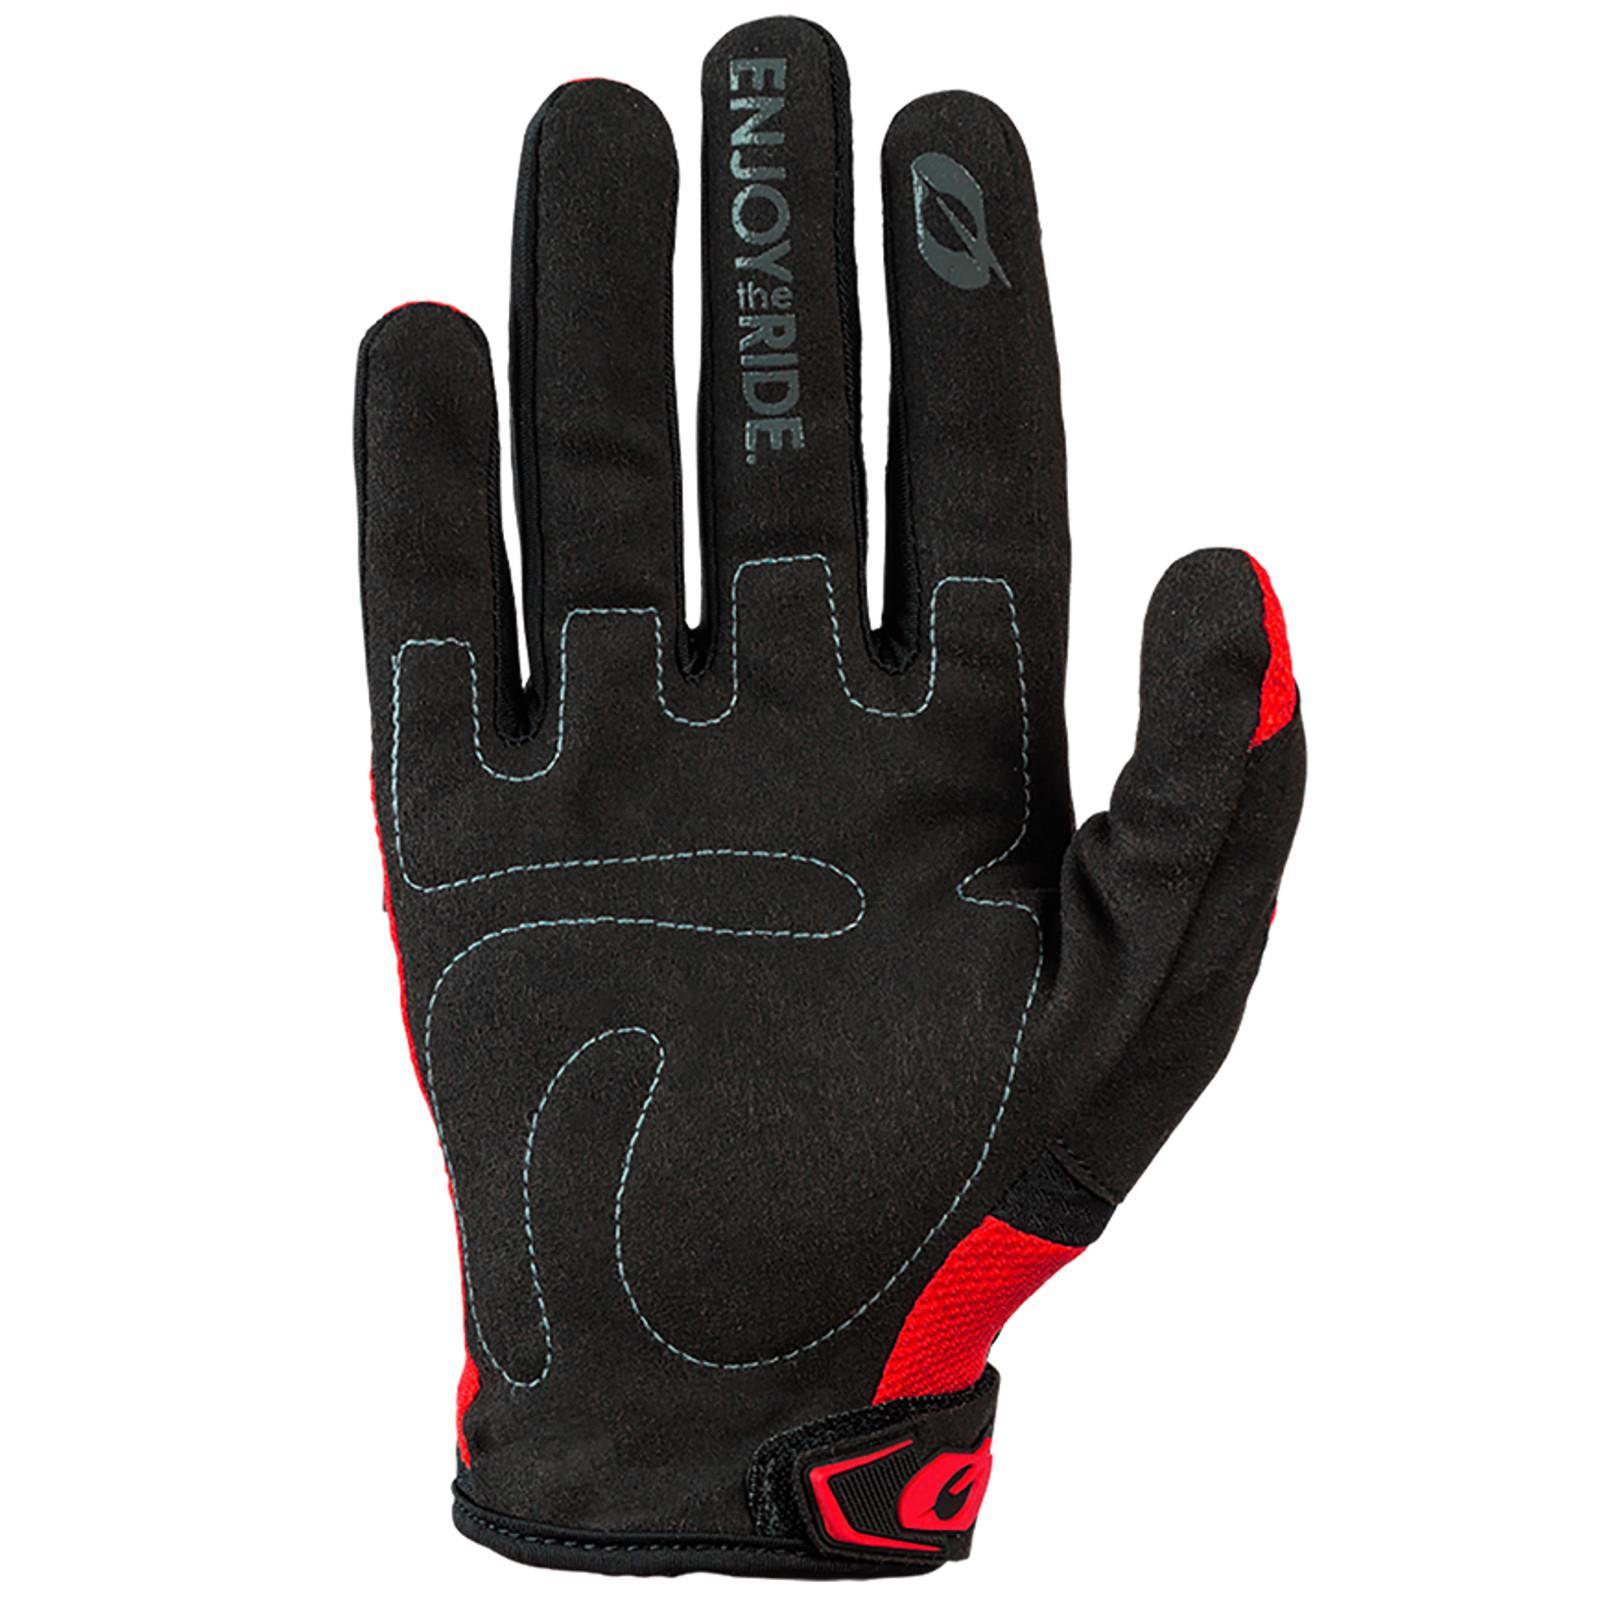 Indexbild 18 - O'Neal Herren Handschuhe Element Motocross Mountainbike Downhill Fahrrad MTB MX